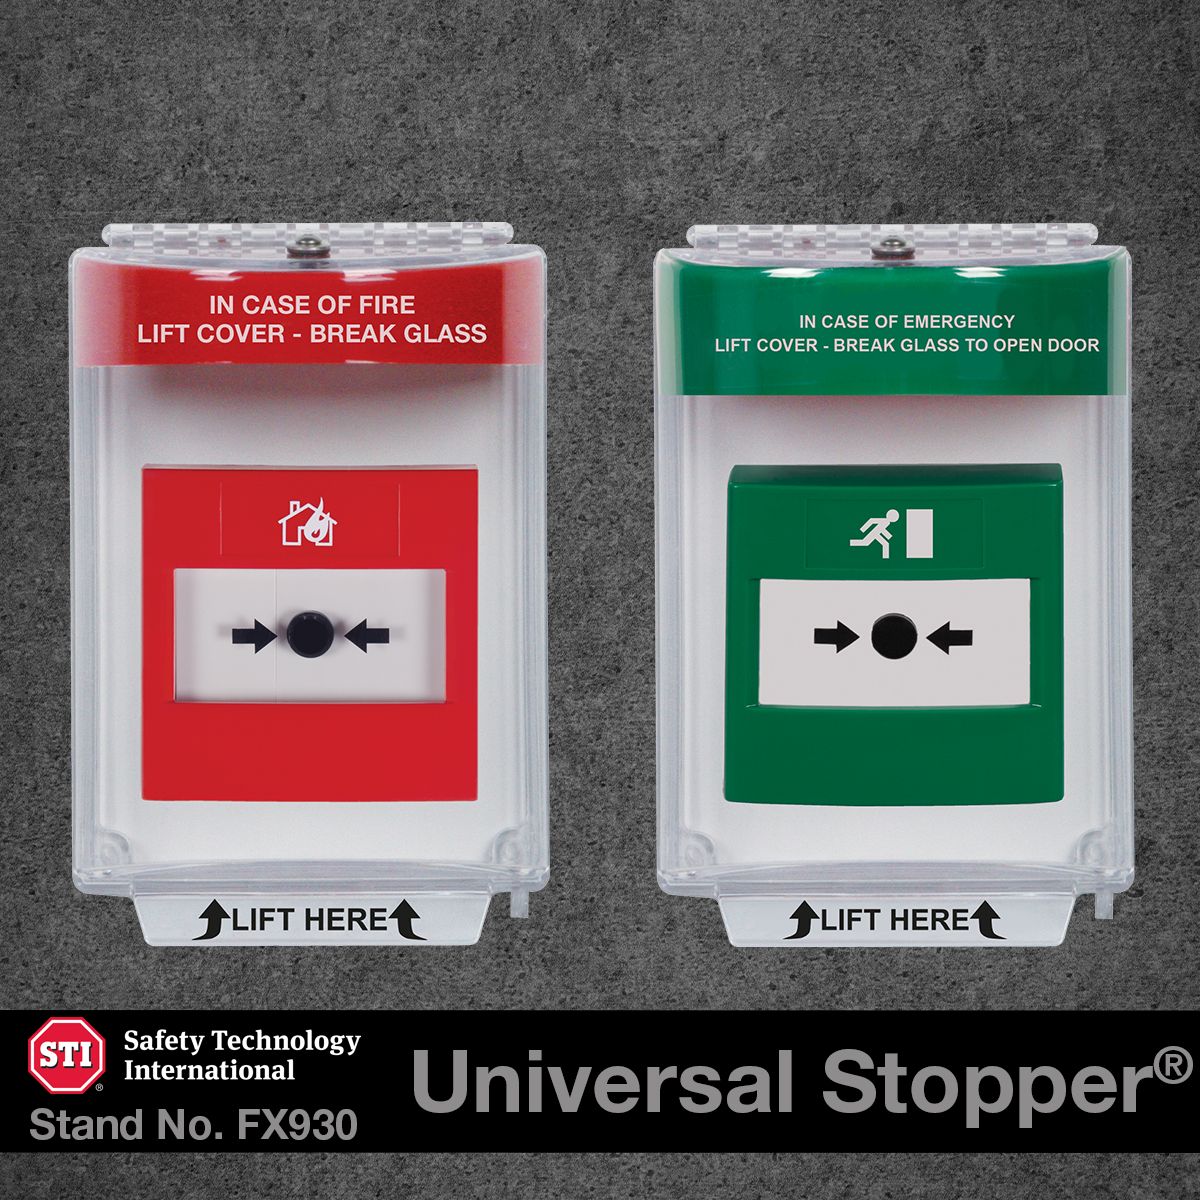 Sti Universal Stopper Safety Technology International Ifsec